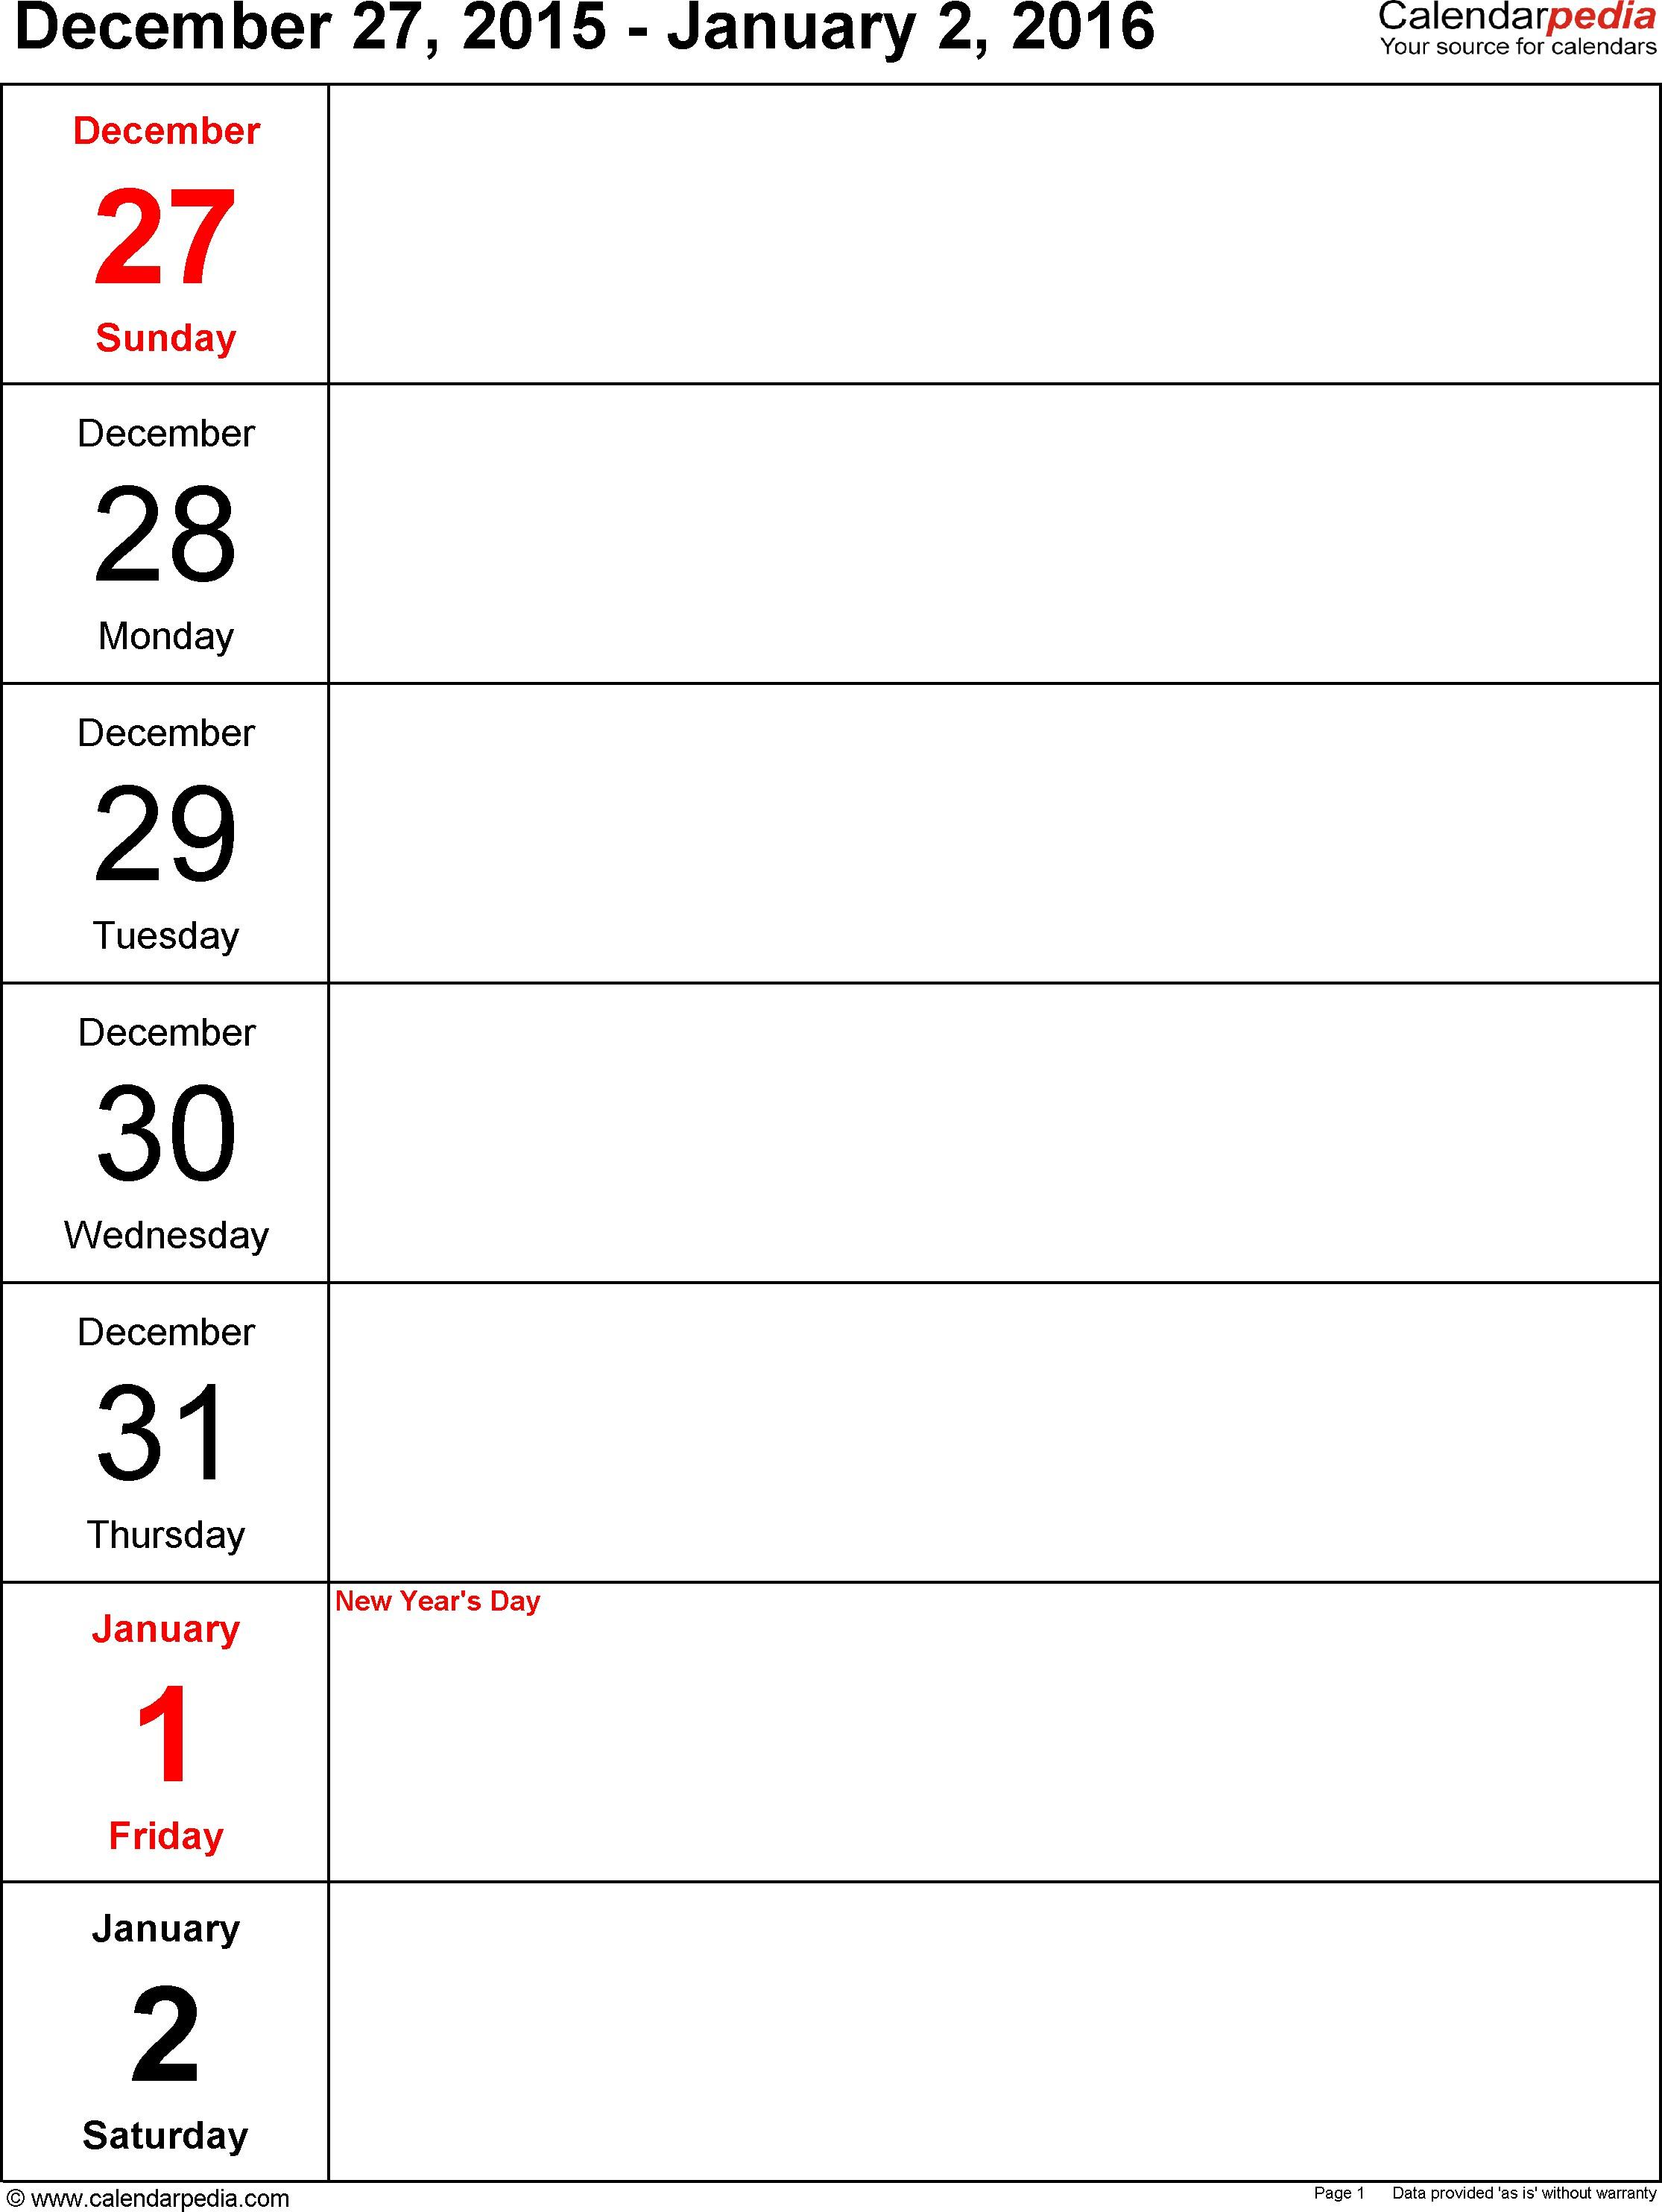 5 Day Printable Calendar Weekly Planner Calendar Template - Calendar with 5 Day Blank Calendar Template